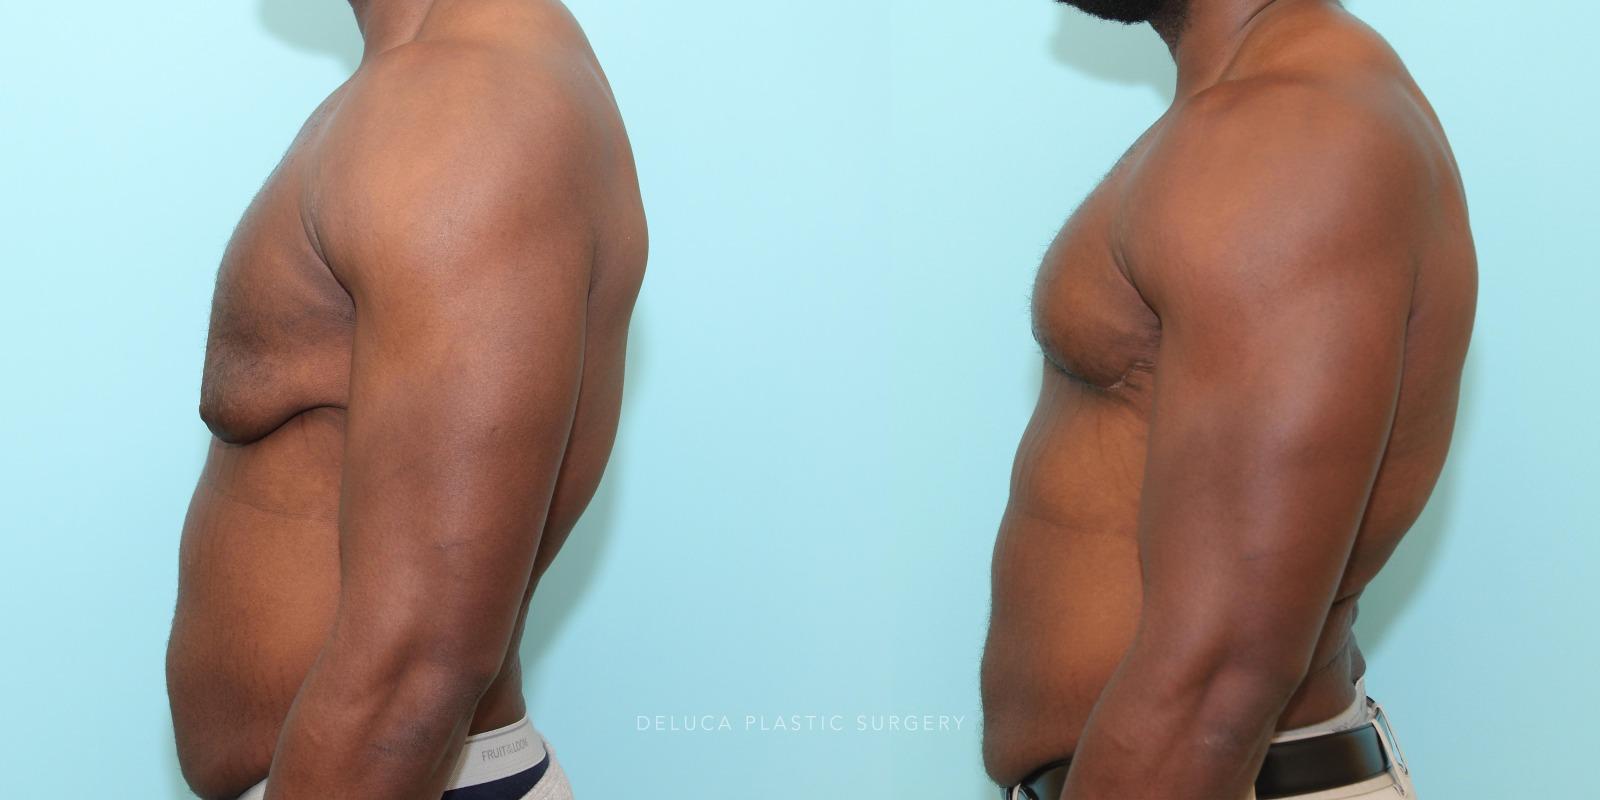 24 year old Correction of Gynecomastia Using Double Incision Free Nipple Graft